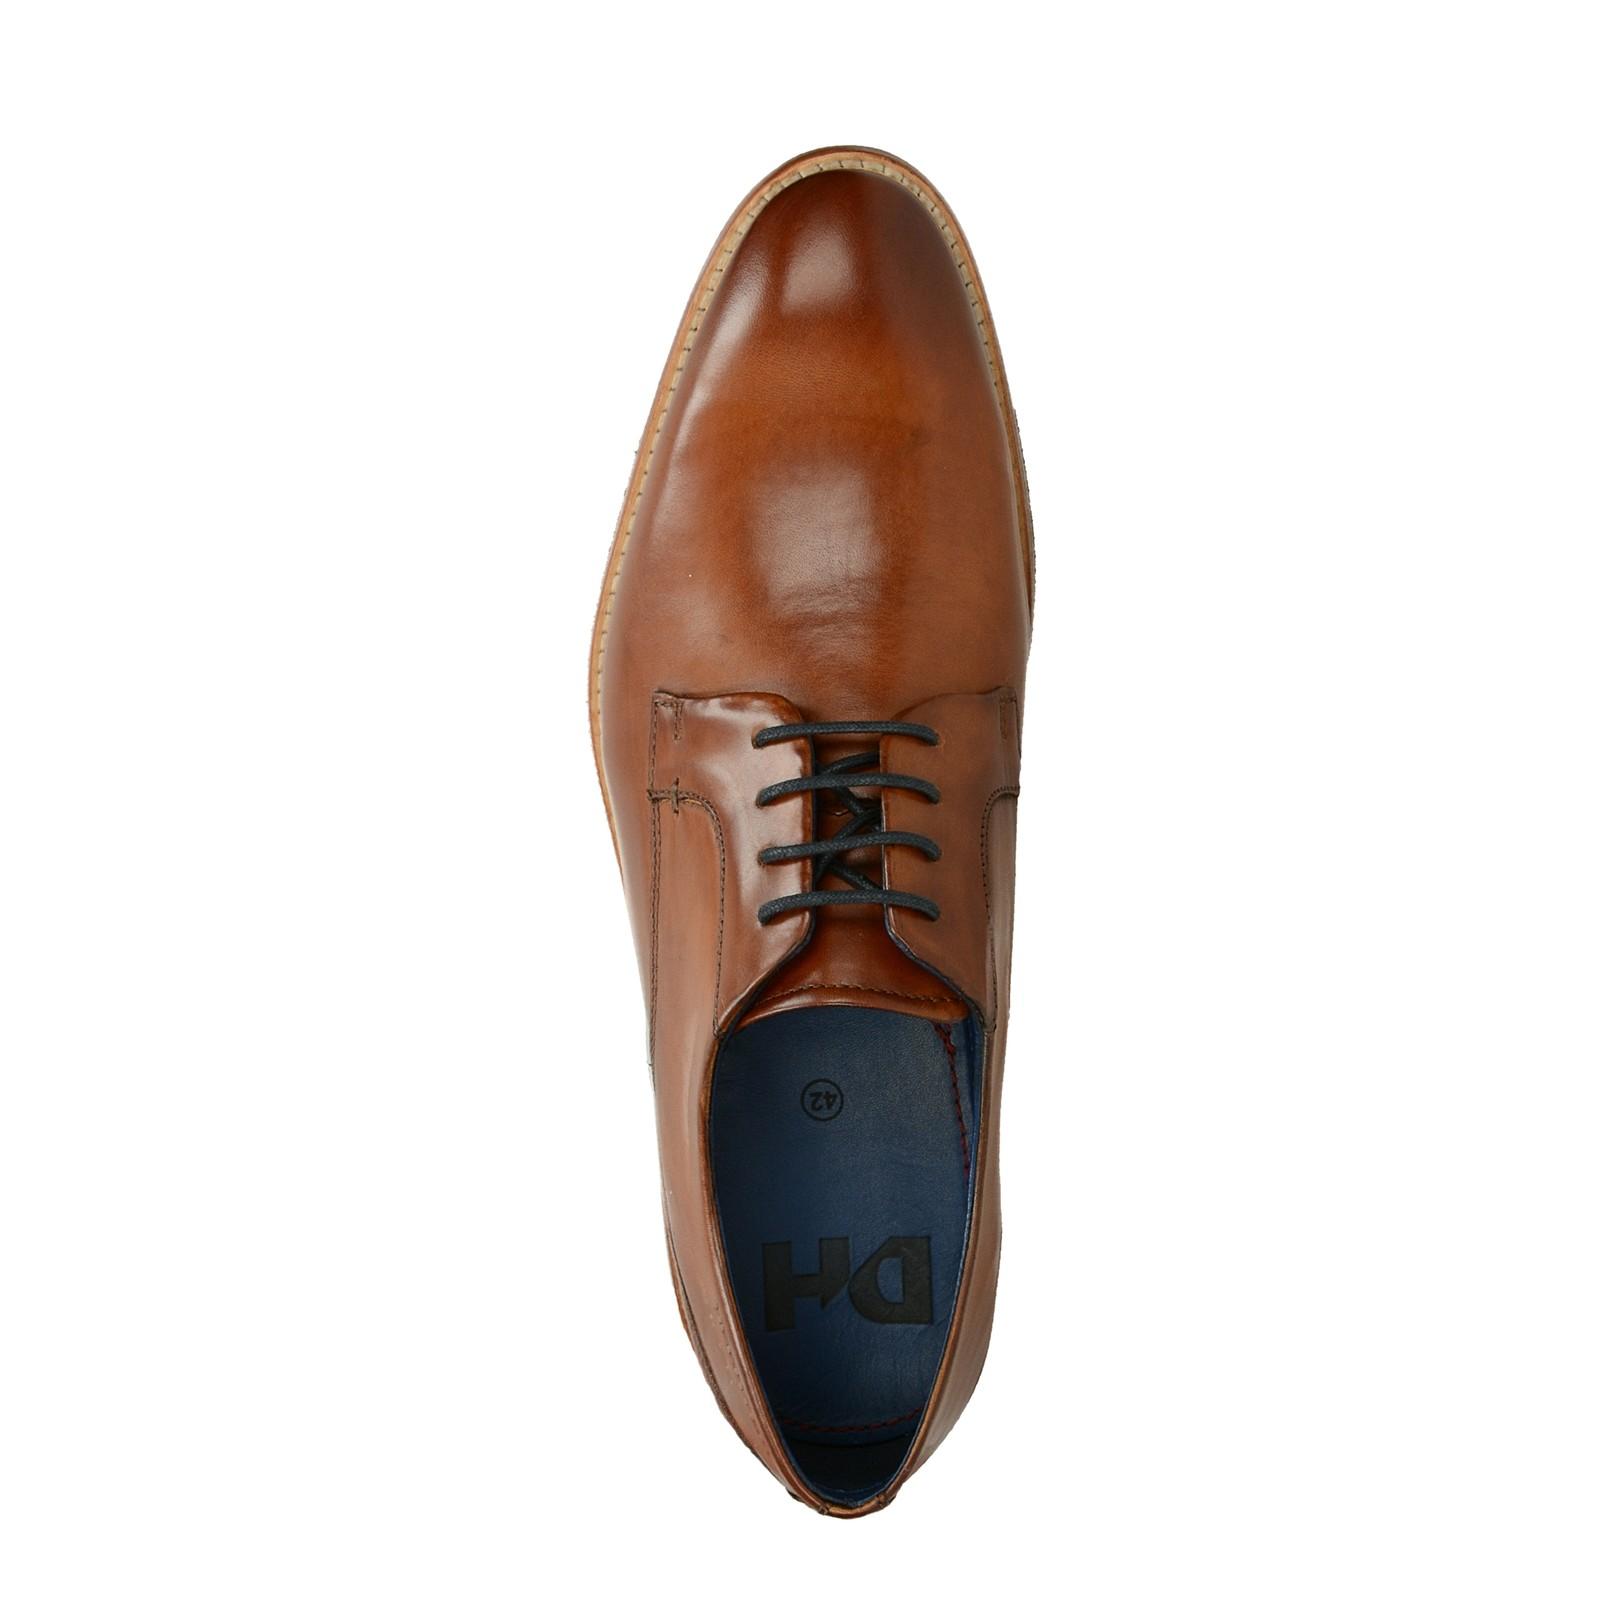 e6a9afba380c Daniel Hechter pánske kožené spoločenské topánky - koňakové ...